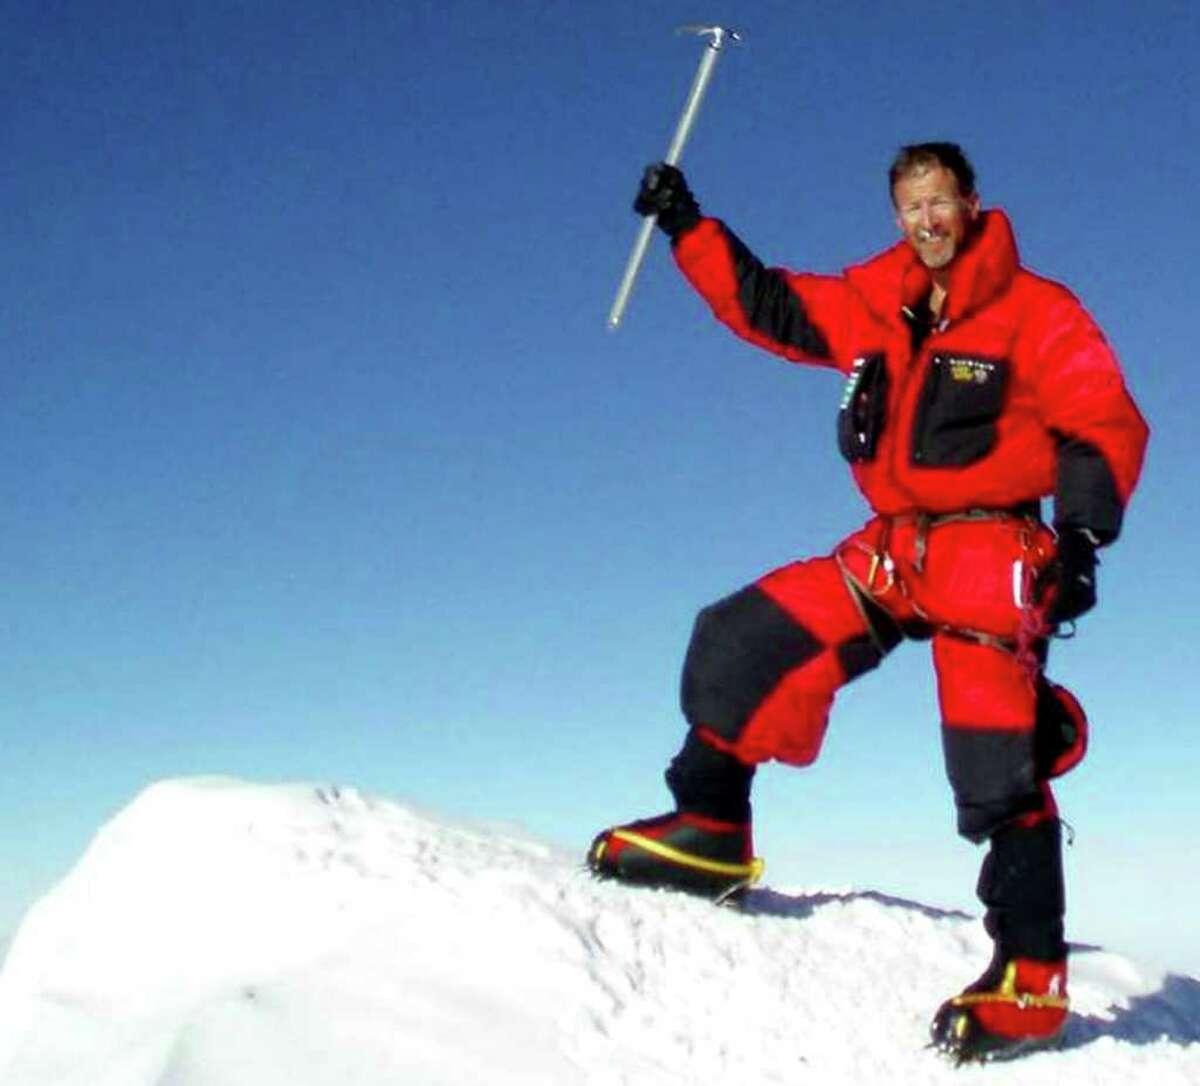 SPECTRUM/Michael Matty, a graduate of New Milford High School, summits Mt. Vinson in Antarctica, Dec. 3, 2007. Courtesy of Michael Matty